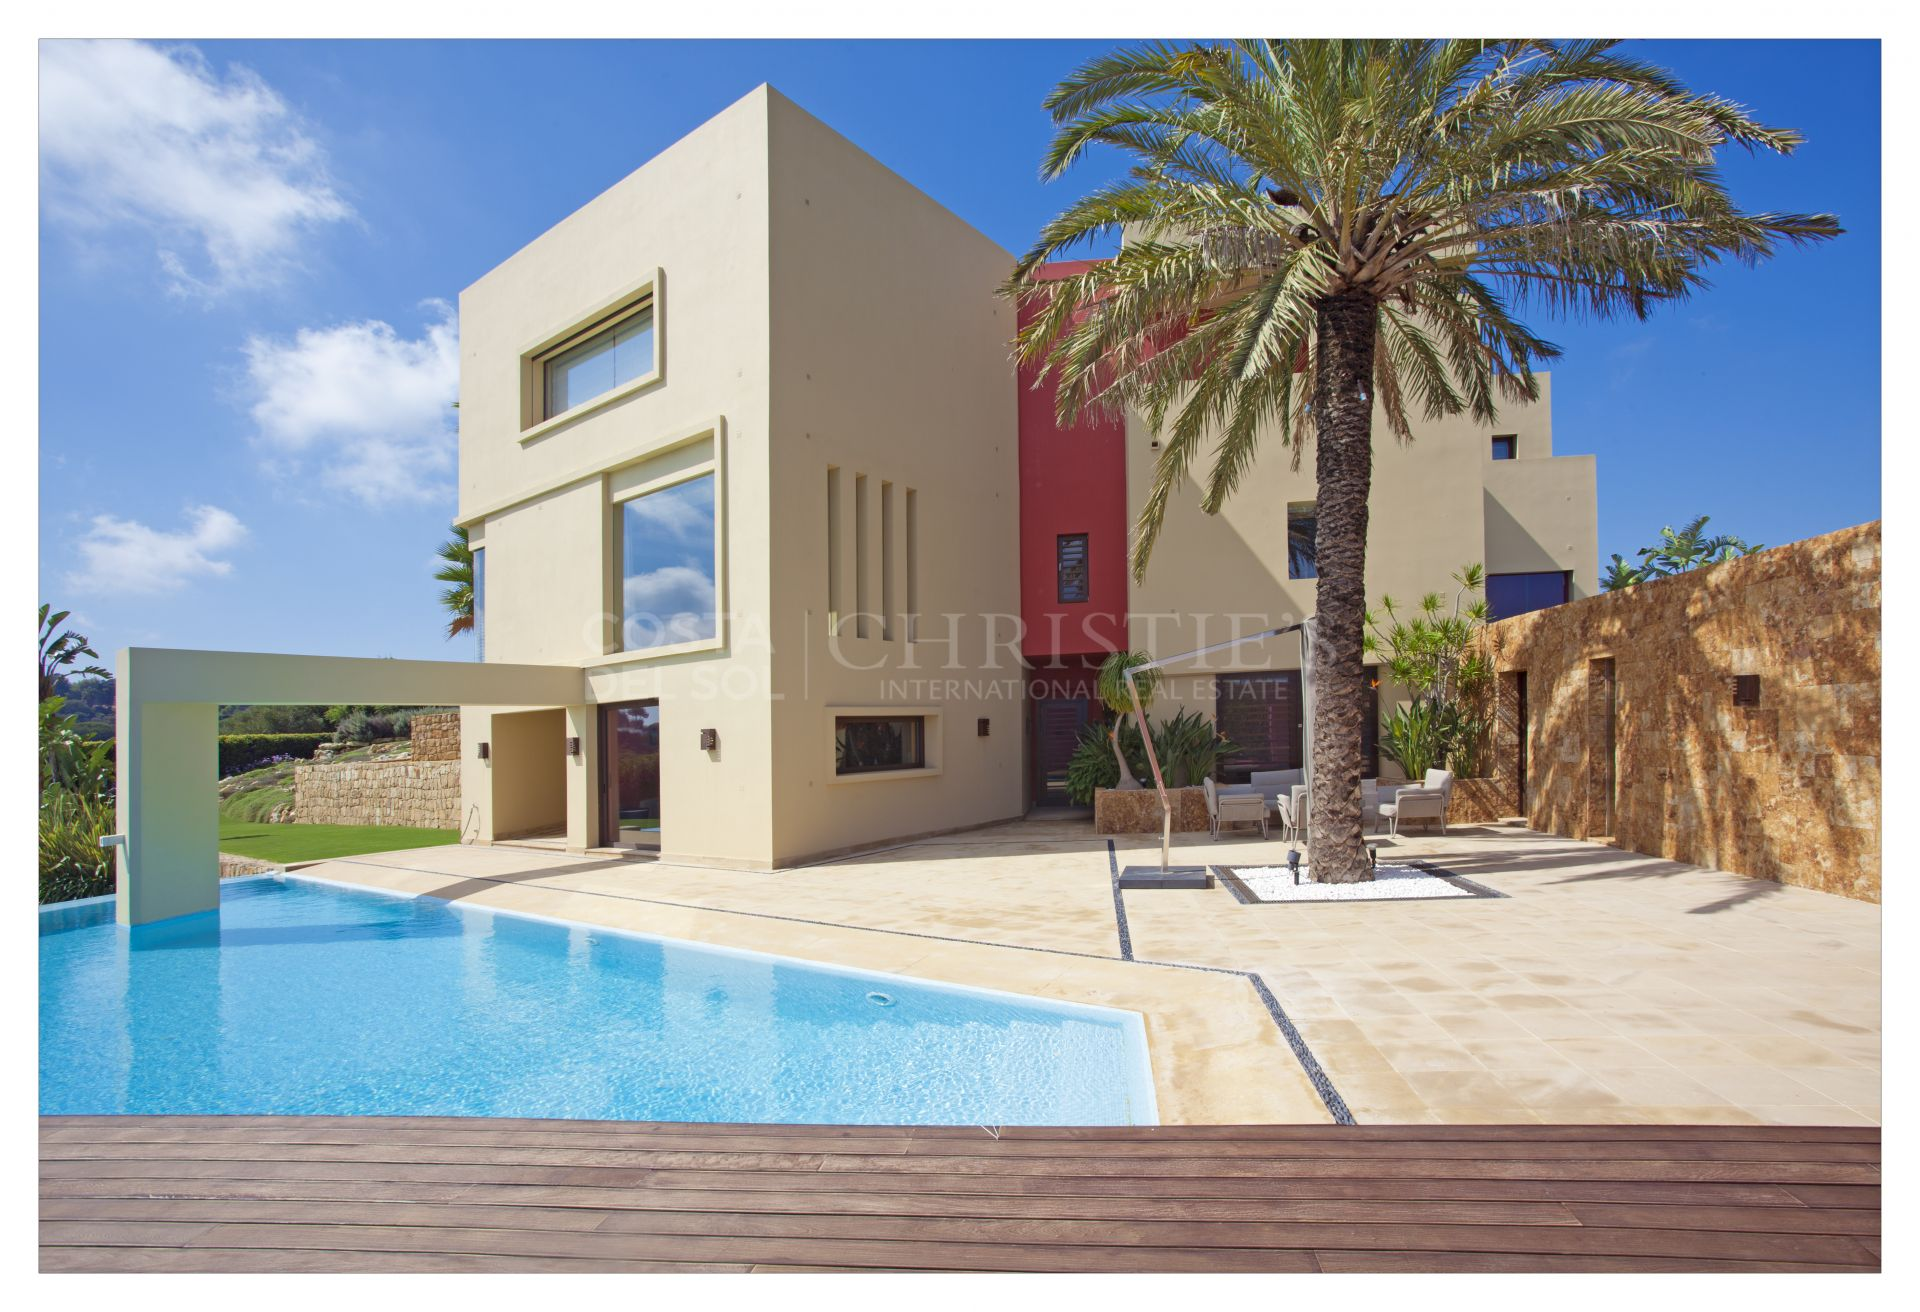 Villa for sale in Sotogrande | Christie's International Real Estate